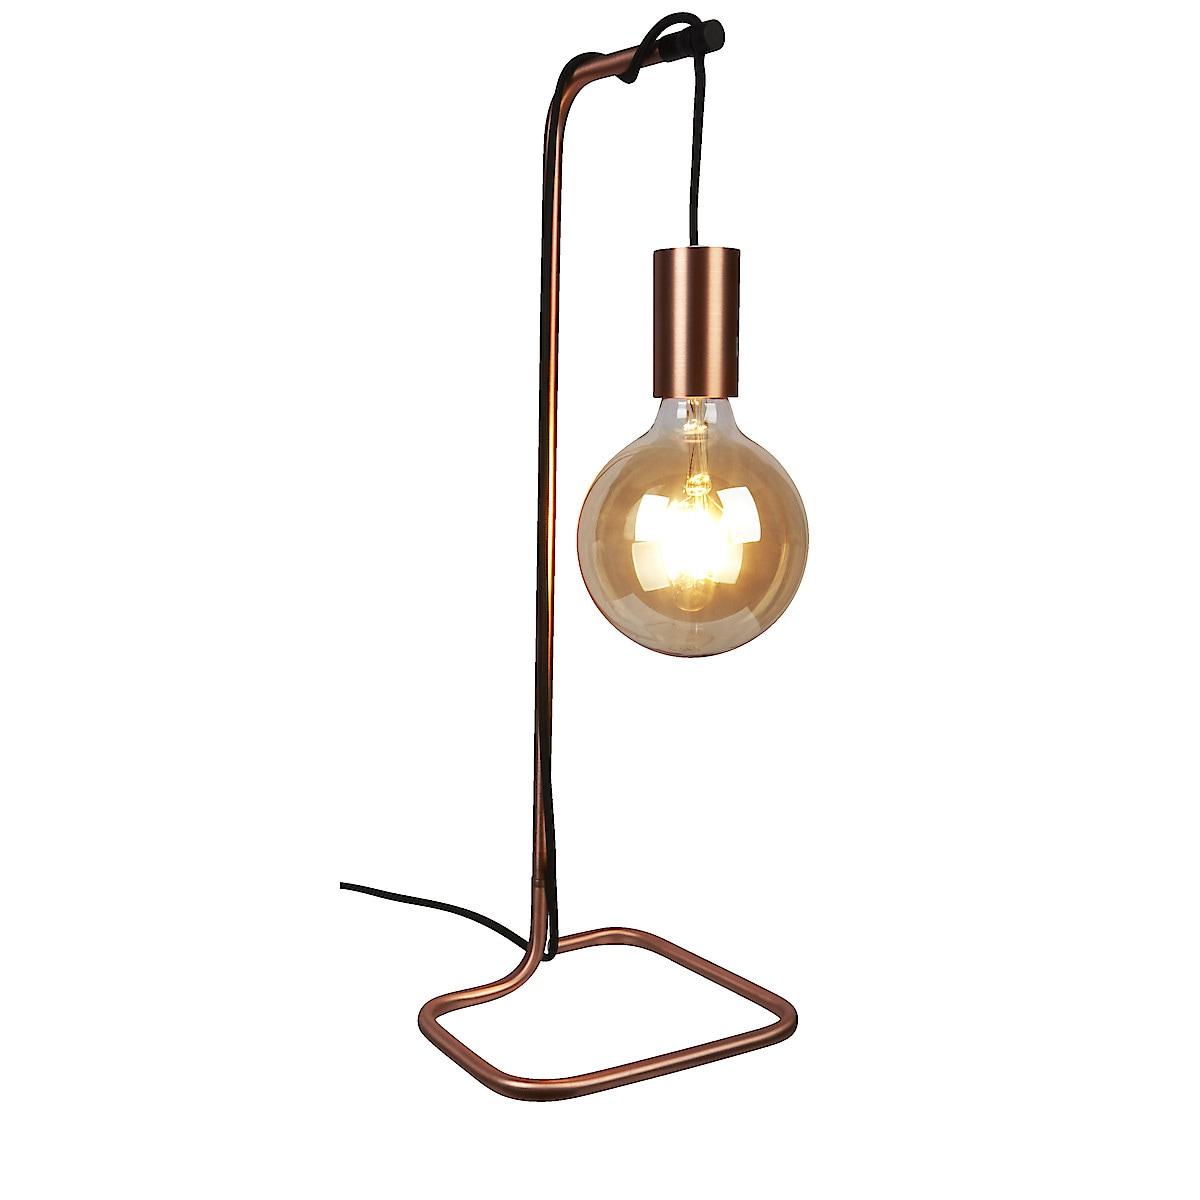 Lampunjalka Rack Northlight